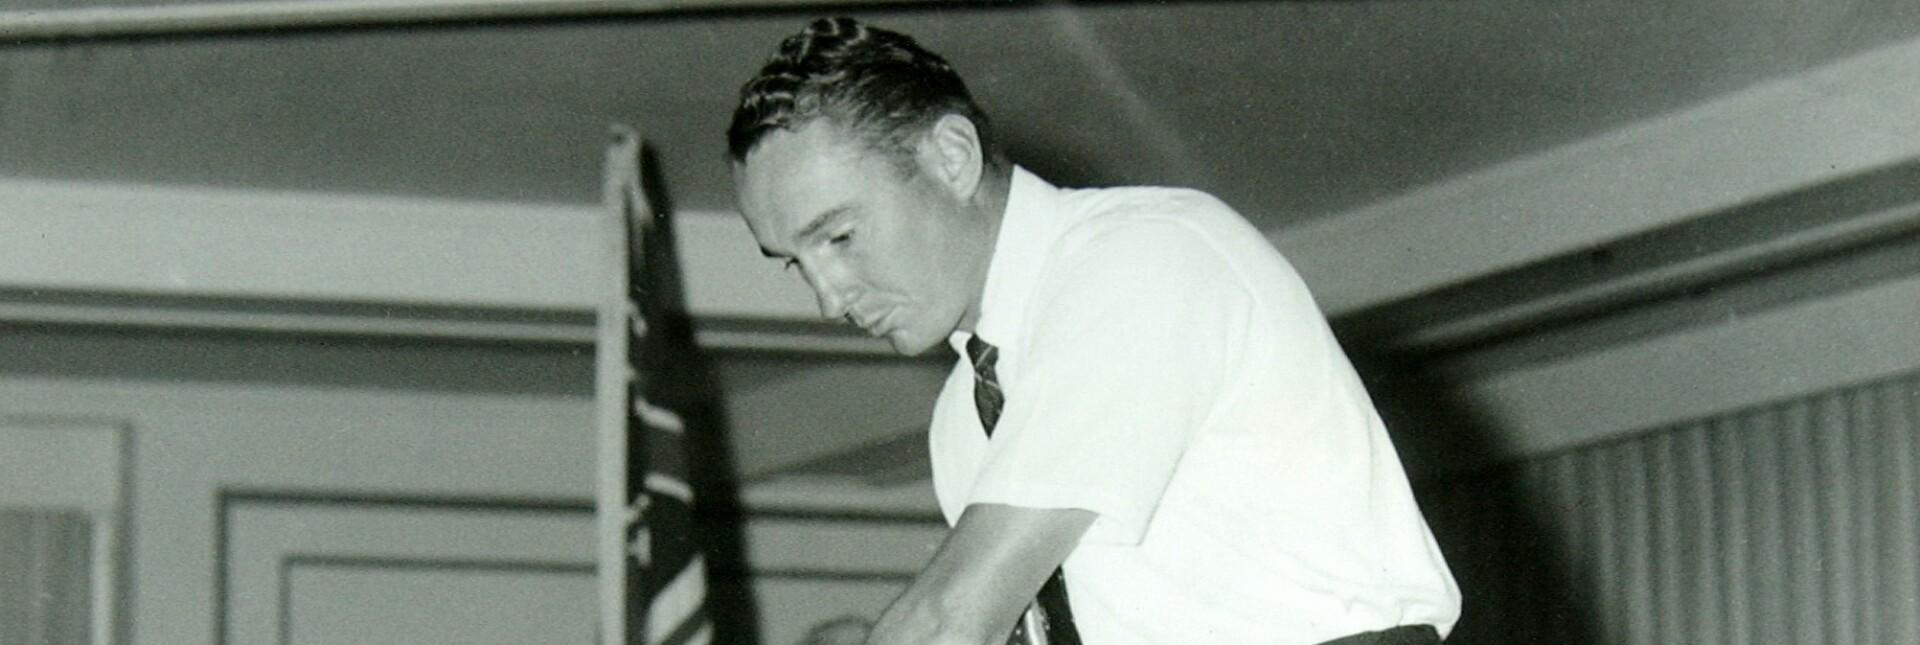 1958, Annual Meeting, Dow Finsterwald, portrait